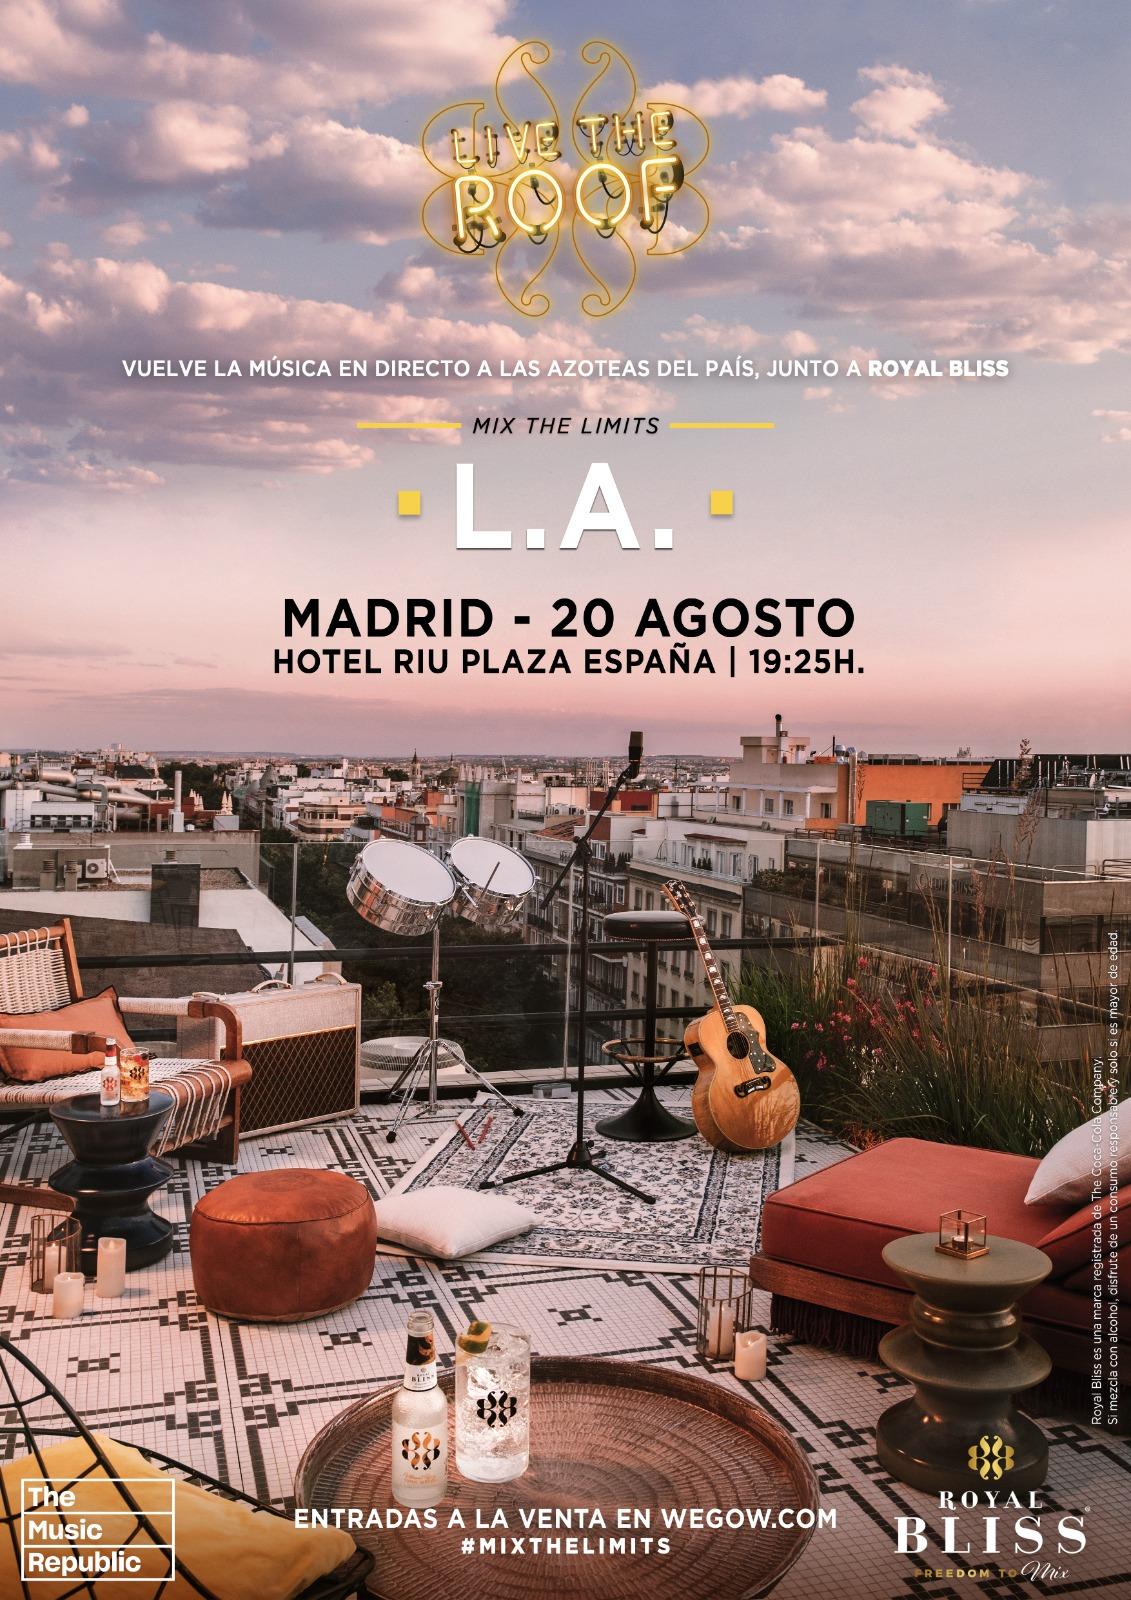 la en live the roof madrid 16237536556438048